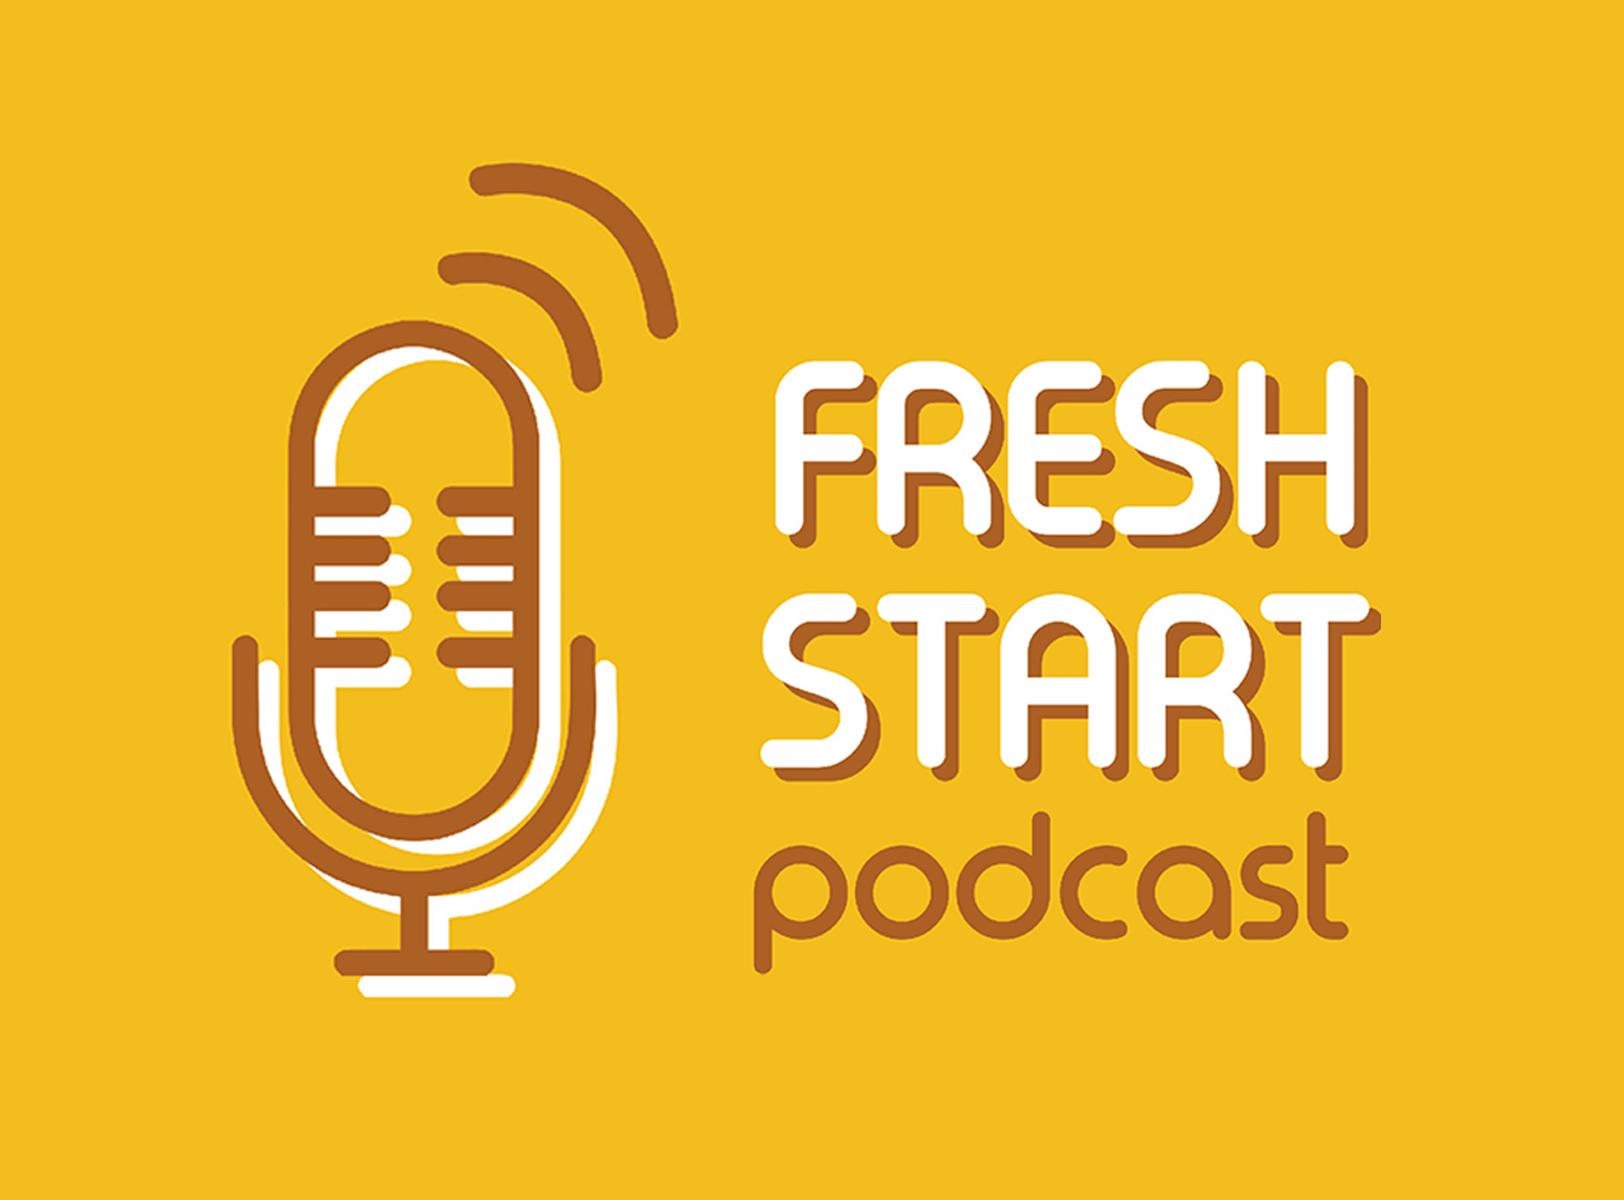 Fresh Start: Podcast News (11/23/2019 Sat.)